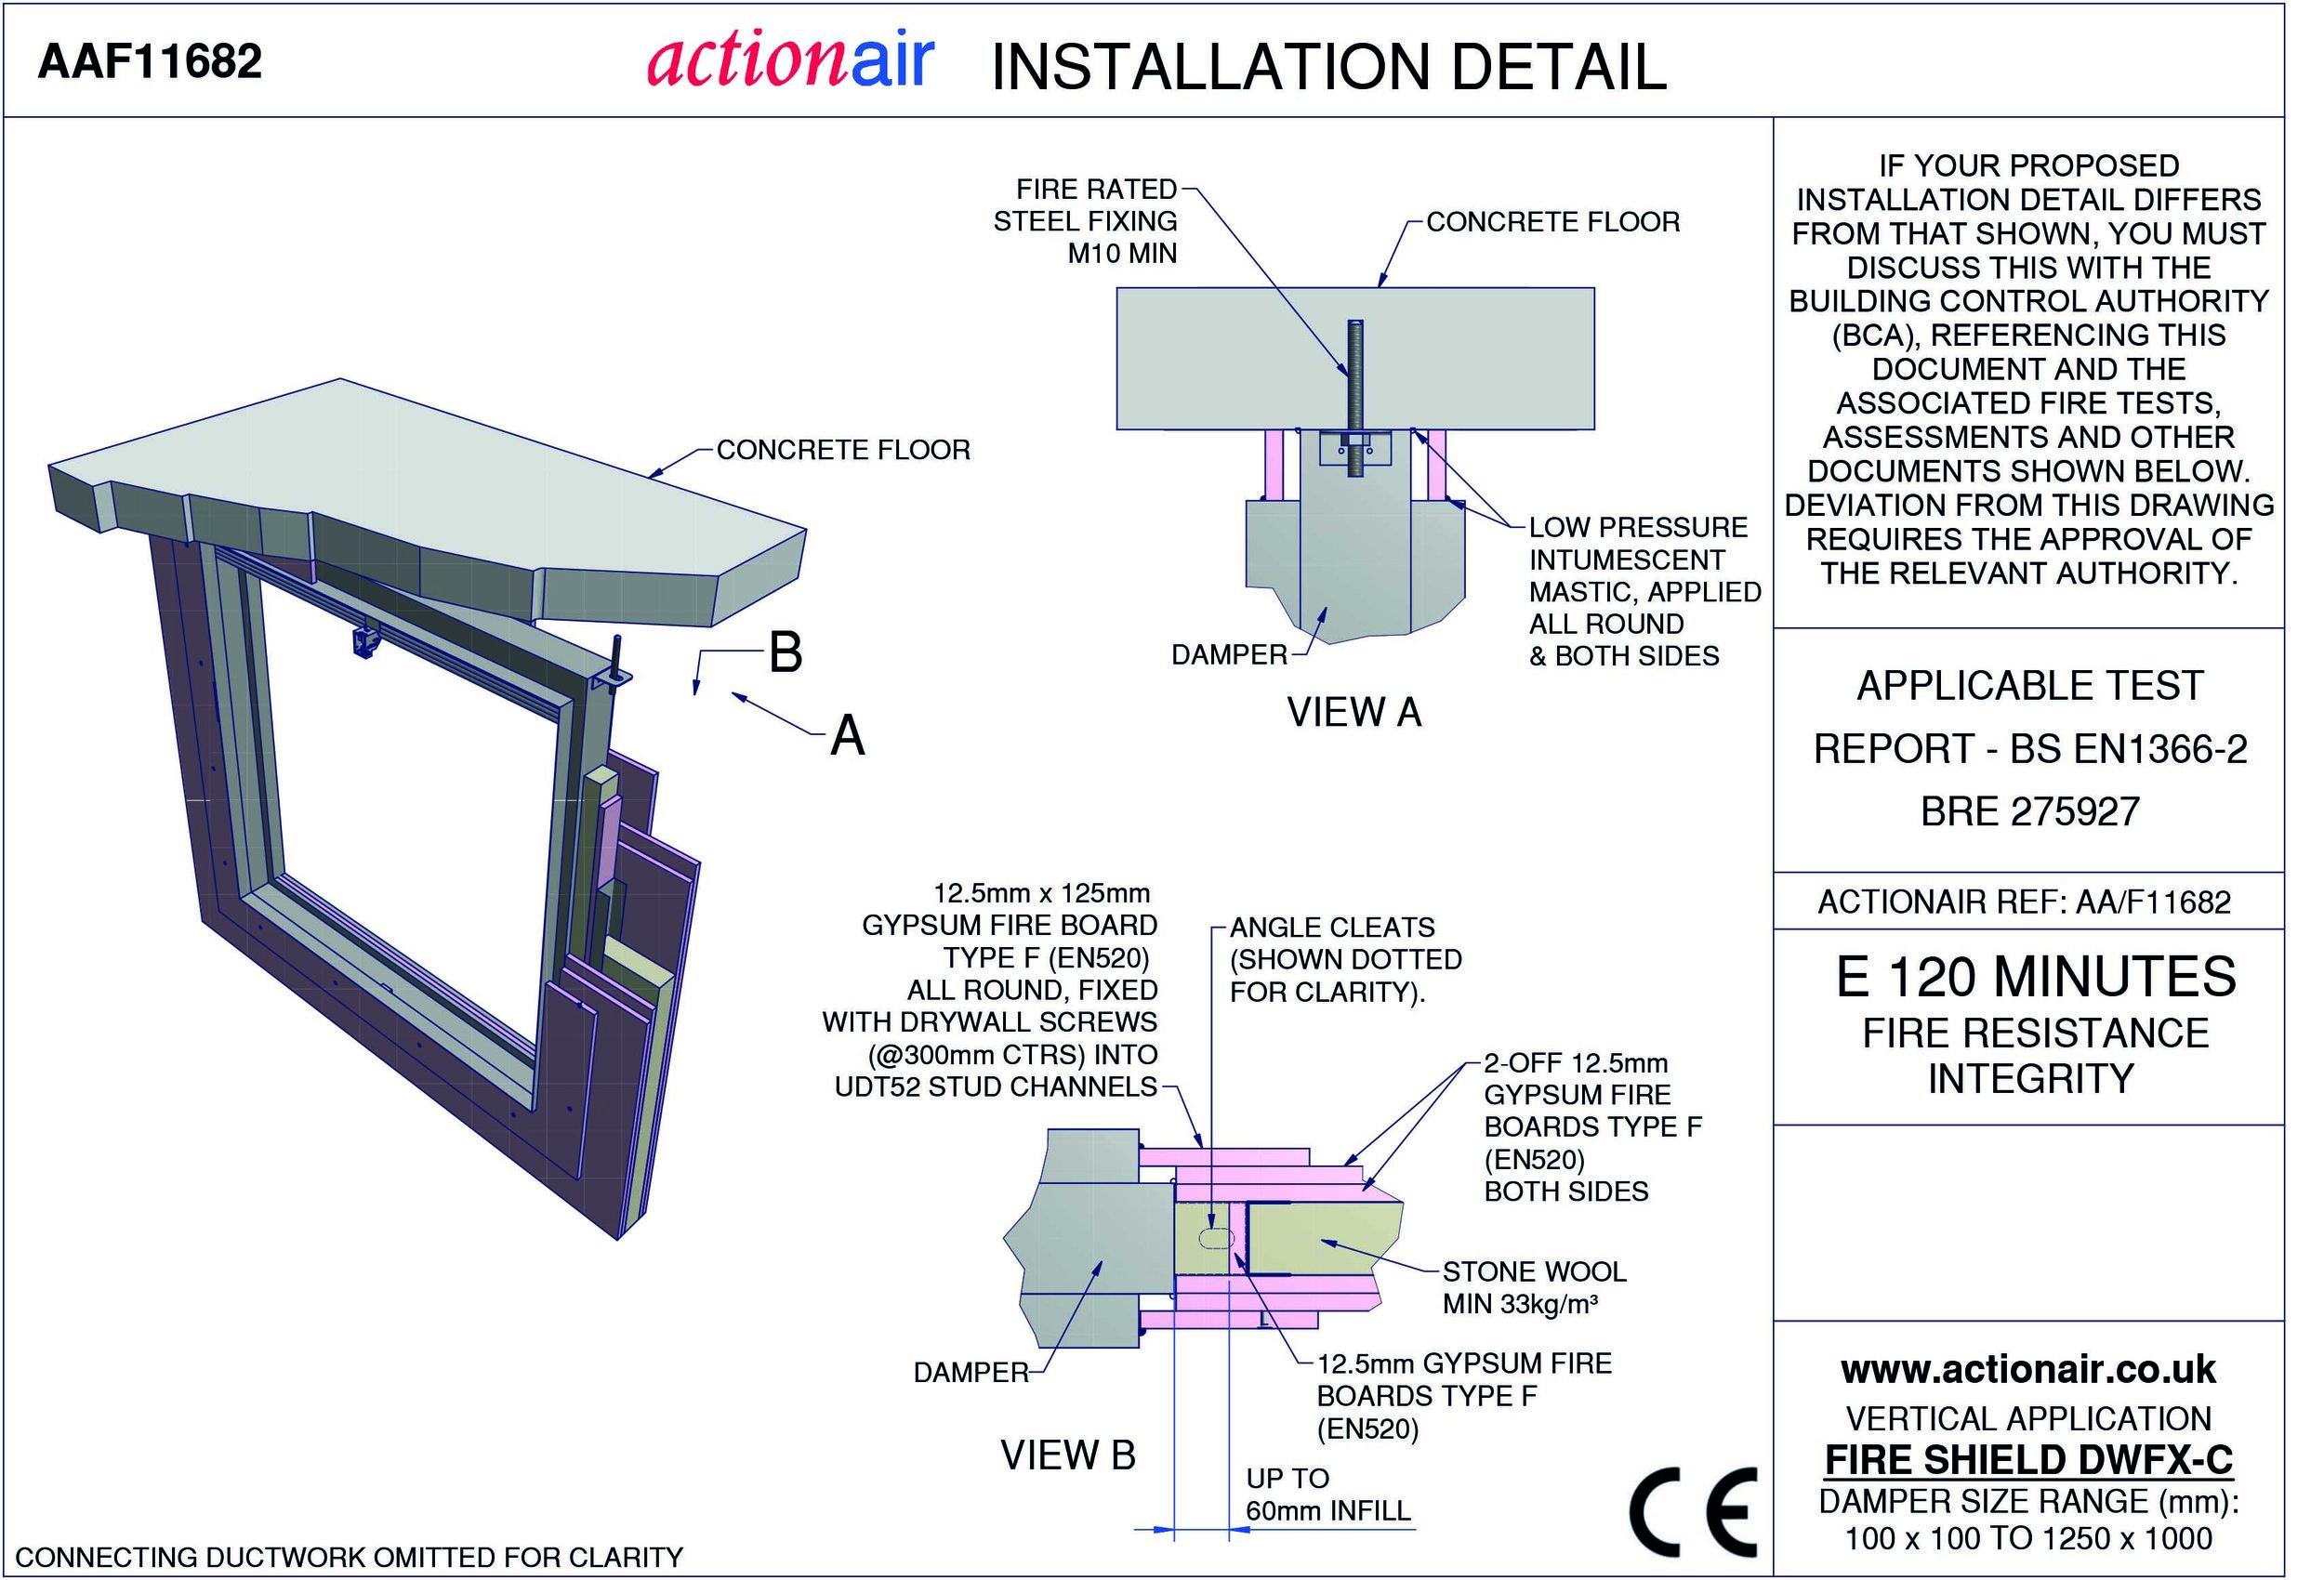 Actionair Fire and Smoke Damper Installation Manual Swegon Air